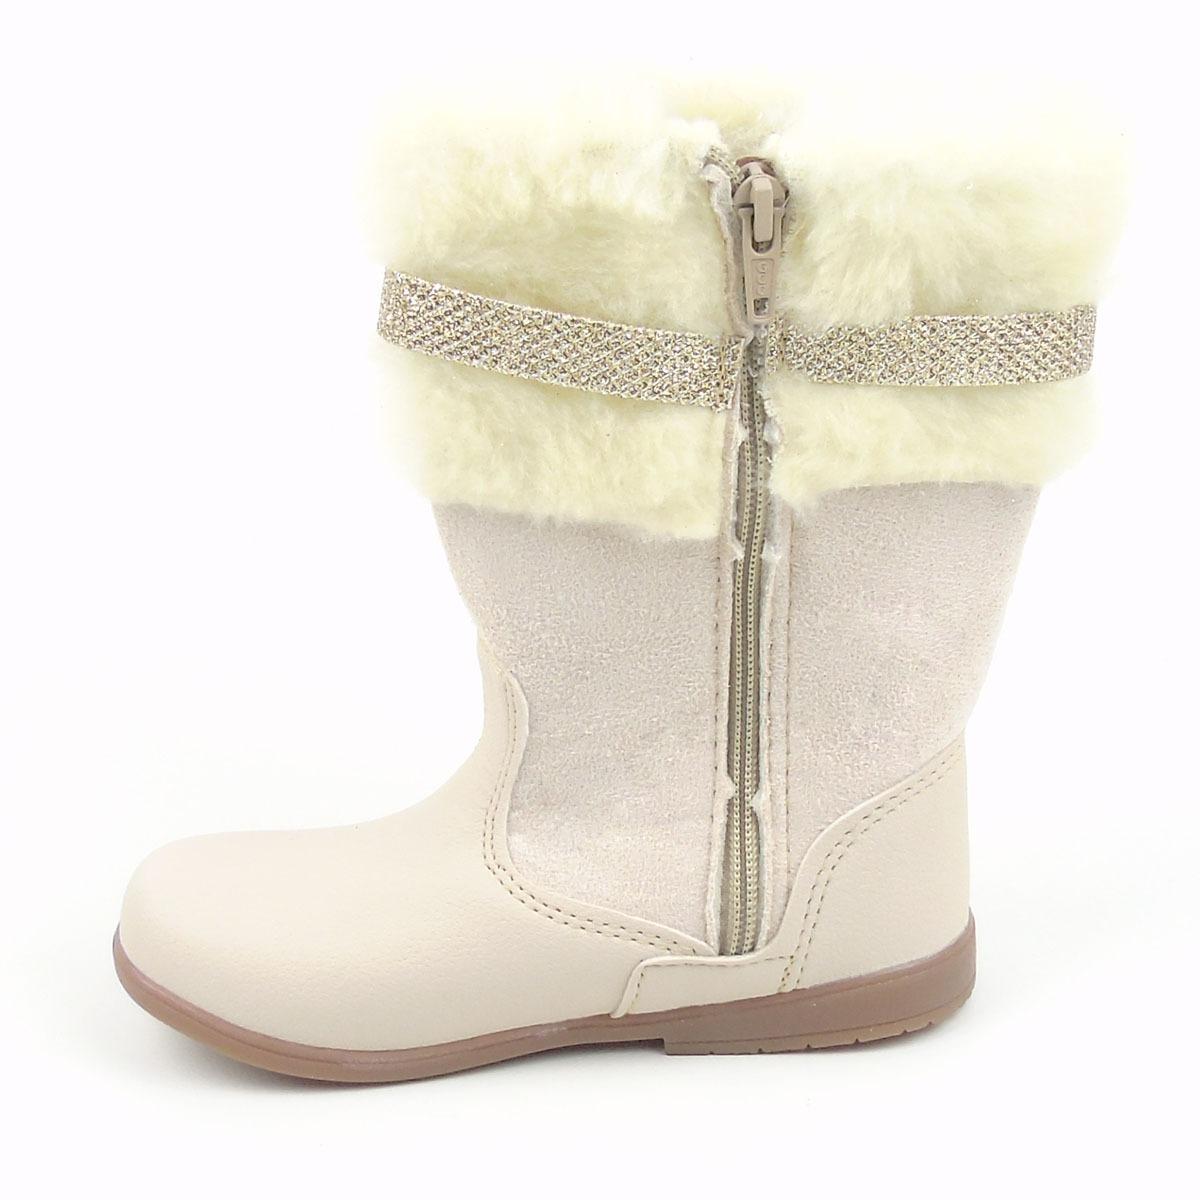 7aa07fd823 bota feminina infantil ortobaby inverno 2018 - 4505. Carregando zoom.